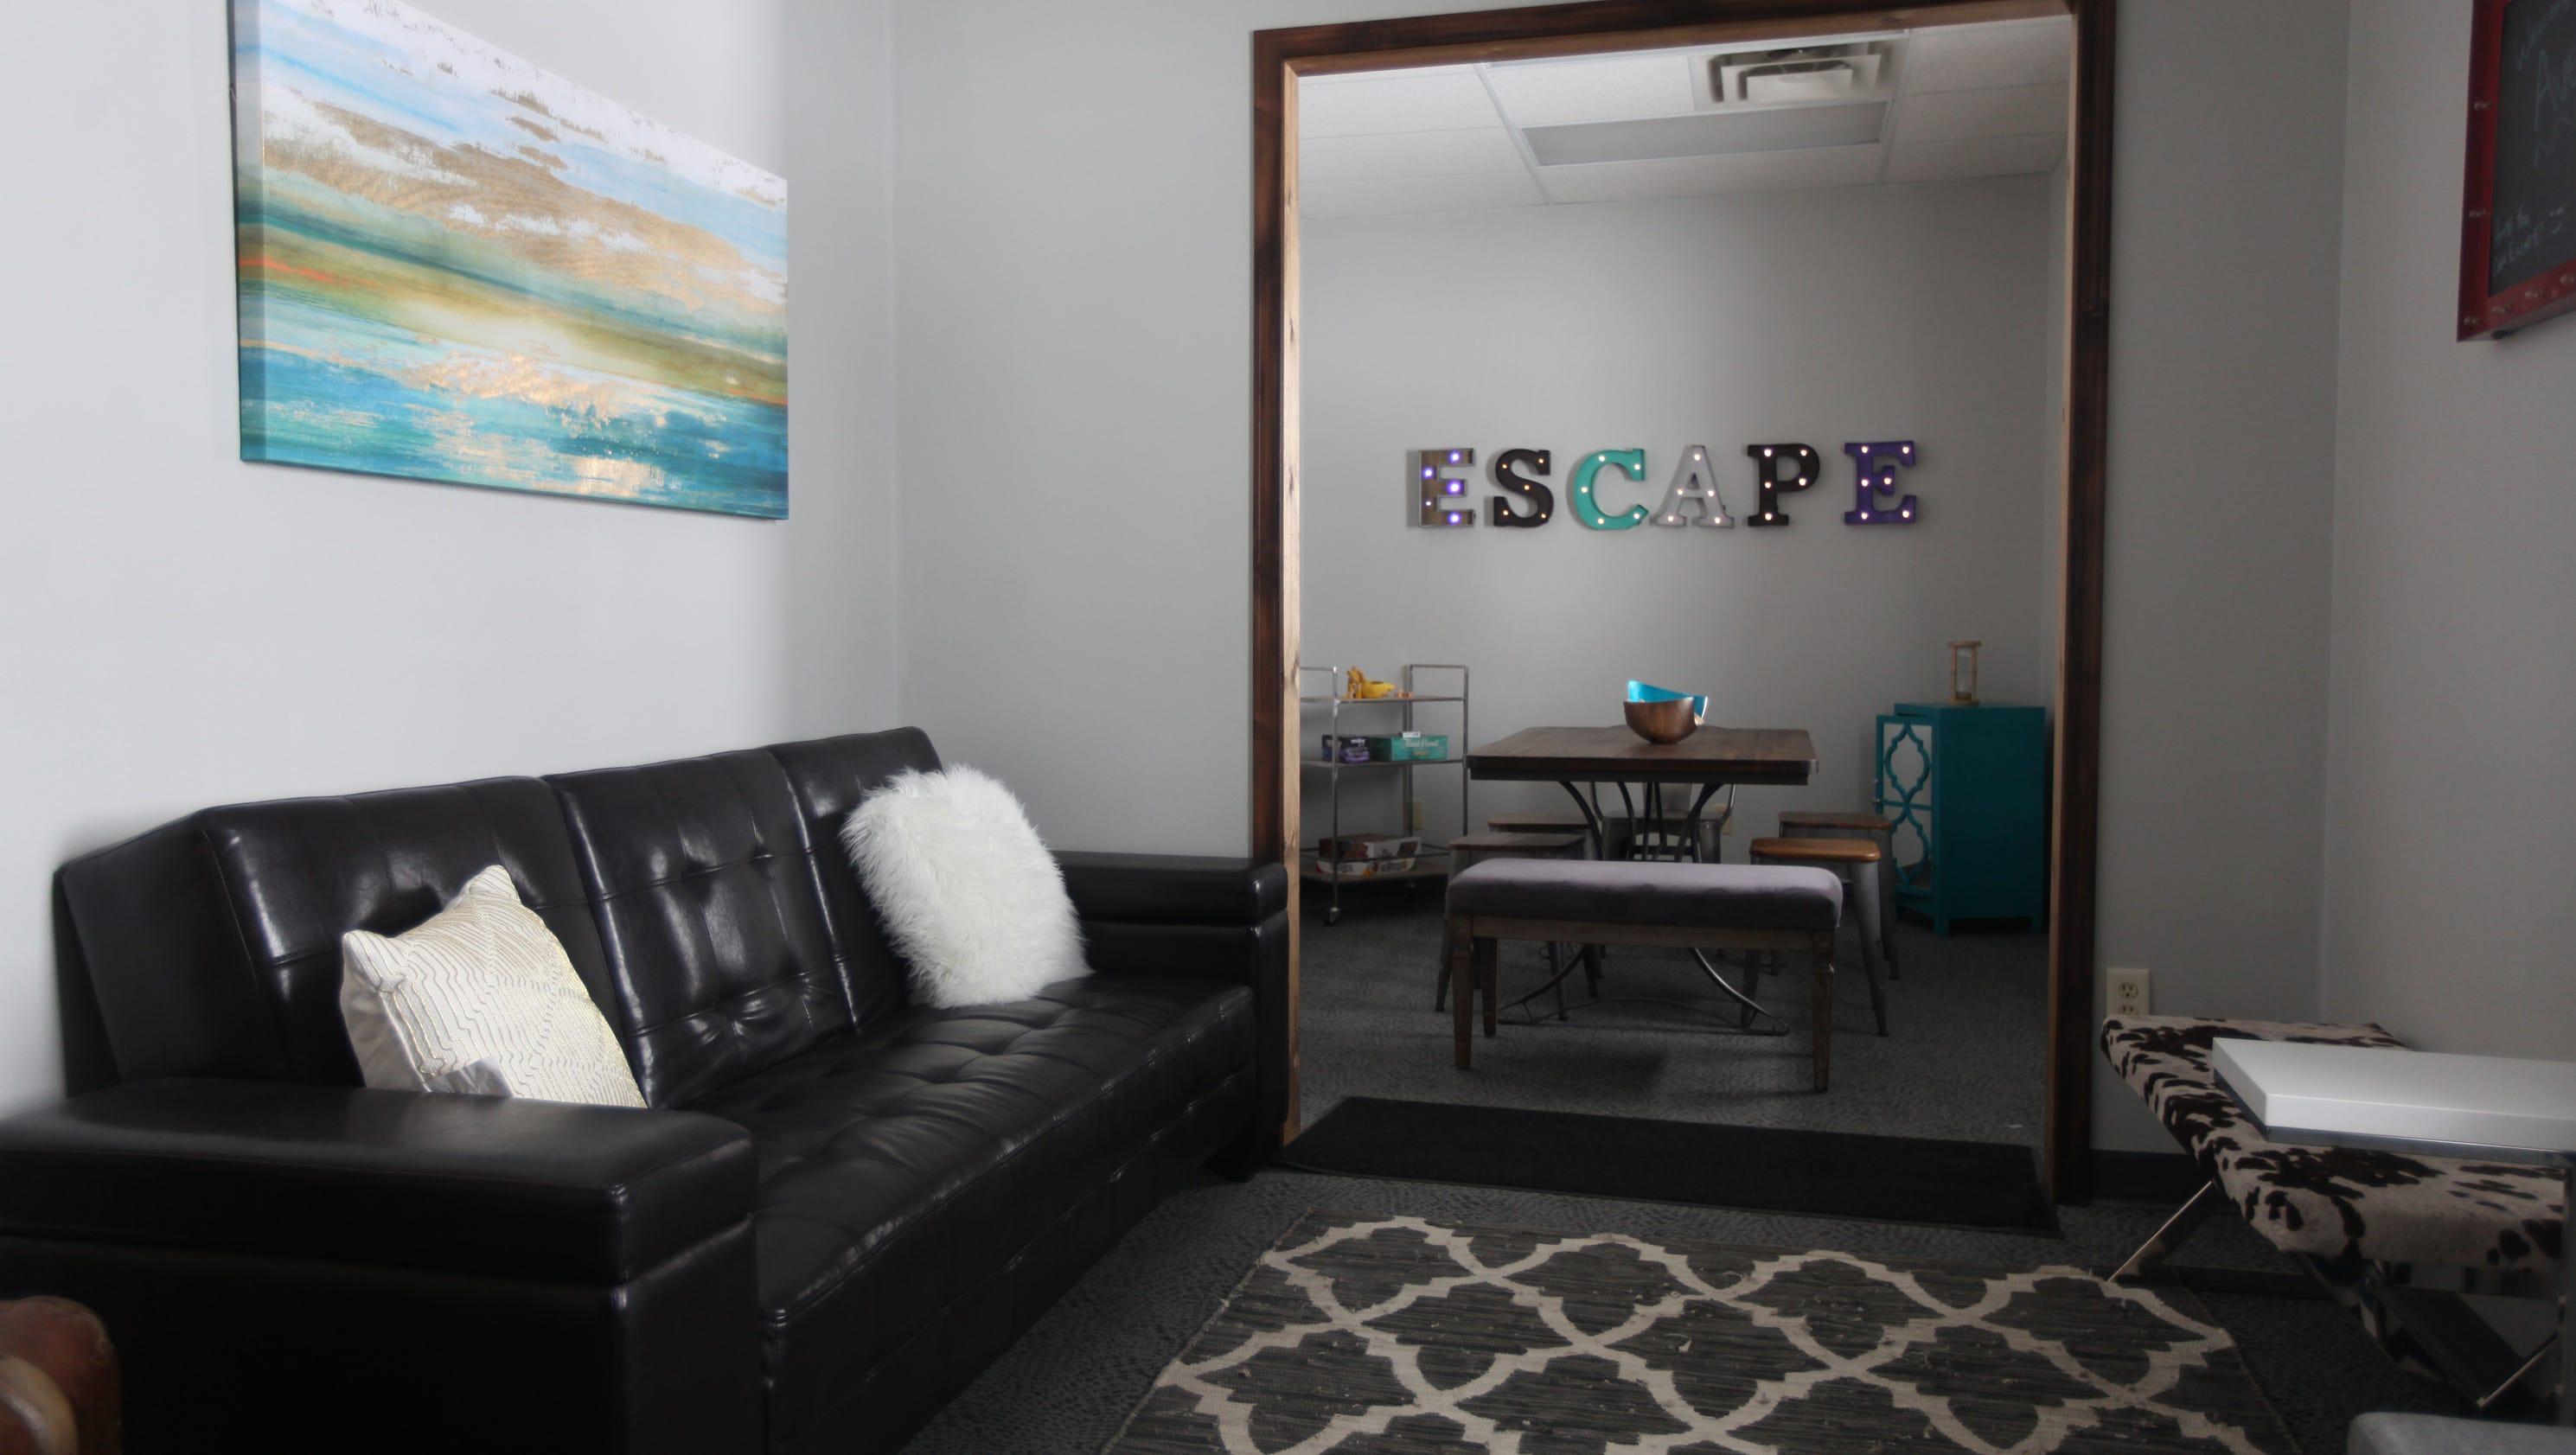 Photos escape 605 escape room for 11 x 13 room